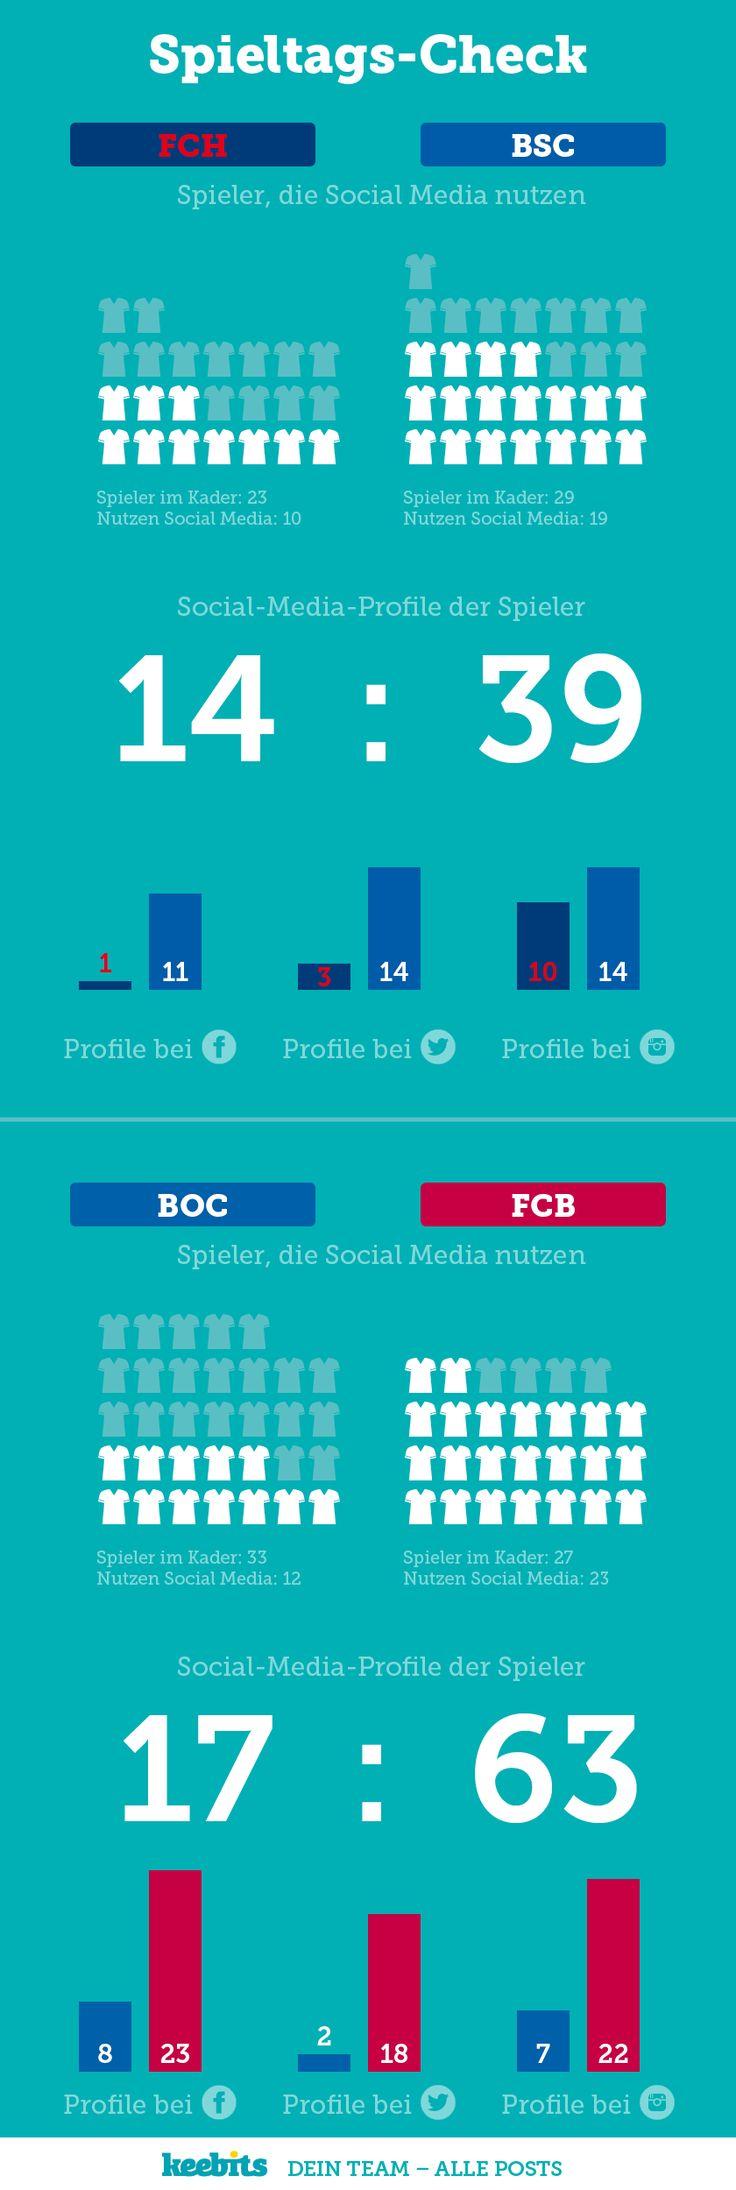 DFB-Pokal, Viertelfinale, 1.FC Heidenheim, Hertha BSC, VfL Bochum, FC Bayern München, keebits, Dein Team – Alle Posts, Social Media, Hub, Social Hub